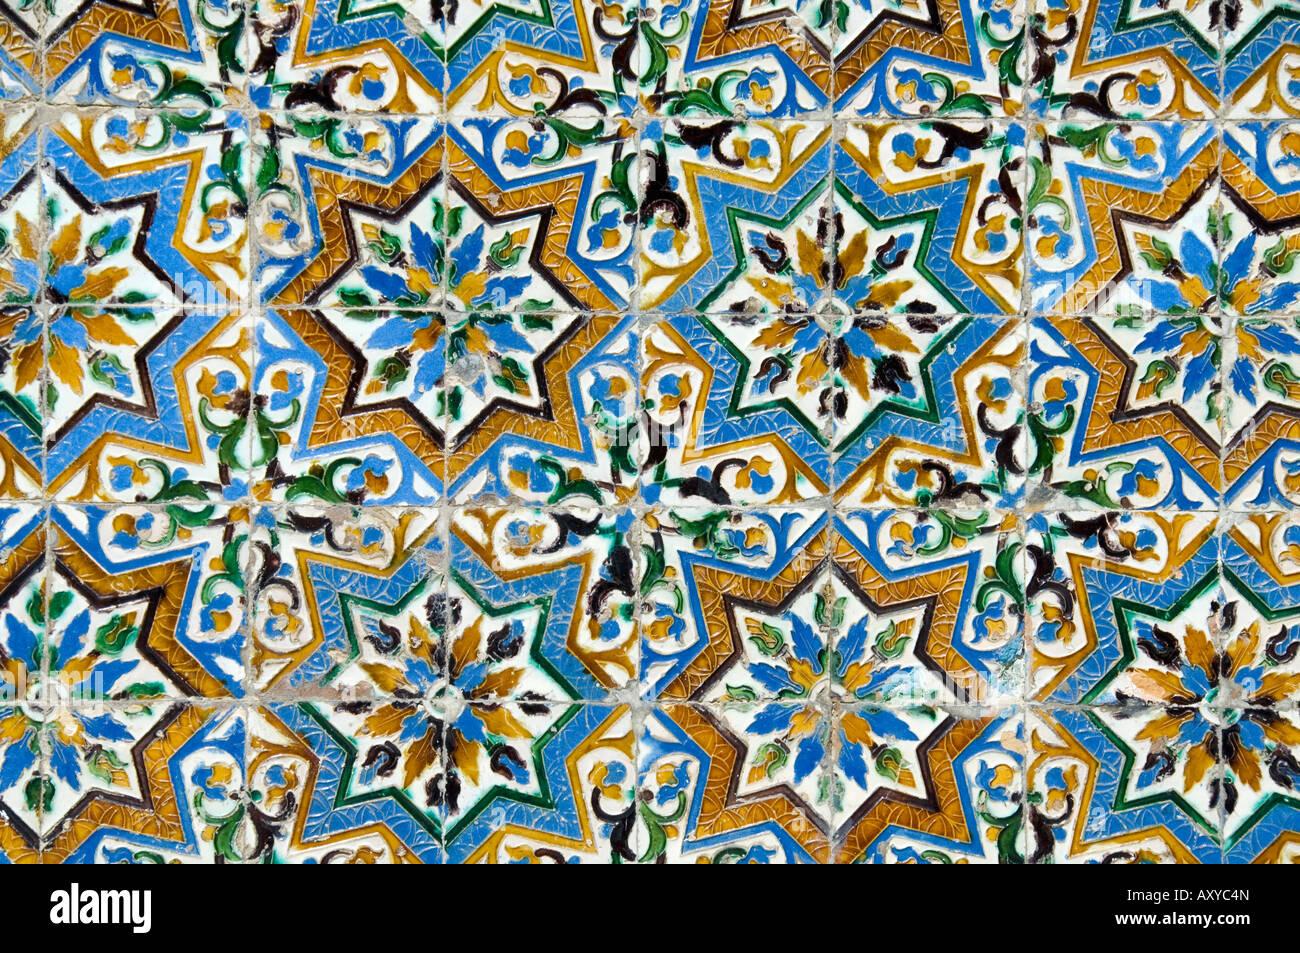 Azulejos tiles in the Mudejar style, Casa de Pilatos, Santa Cruz district, Seville, Andalusia (Andalucia), Spain, - Stock Image